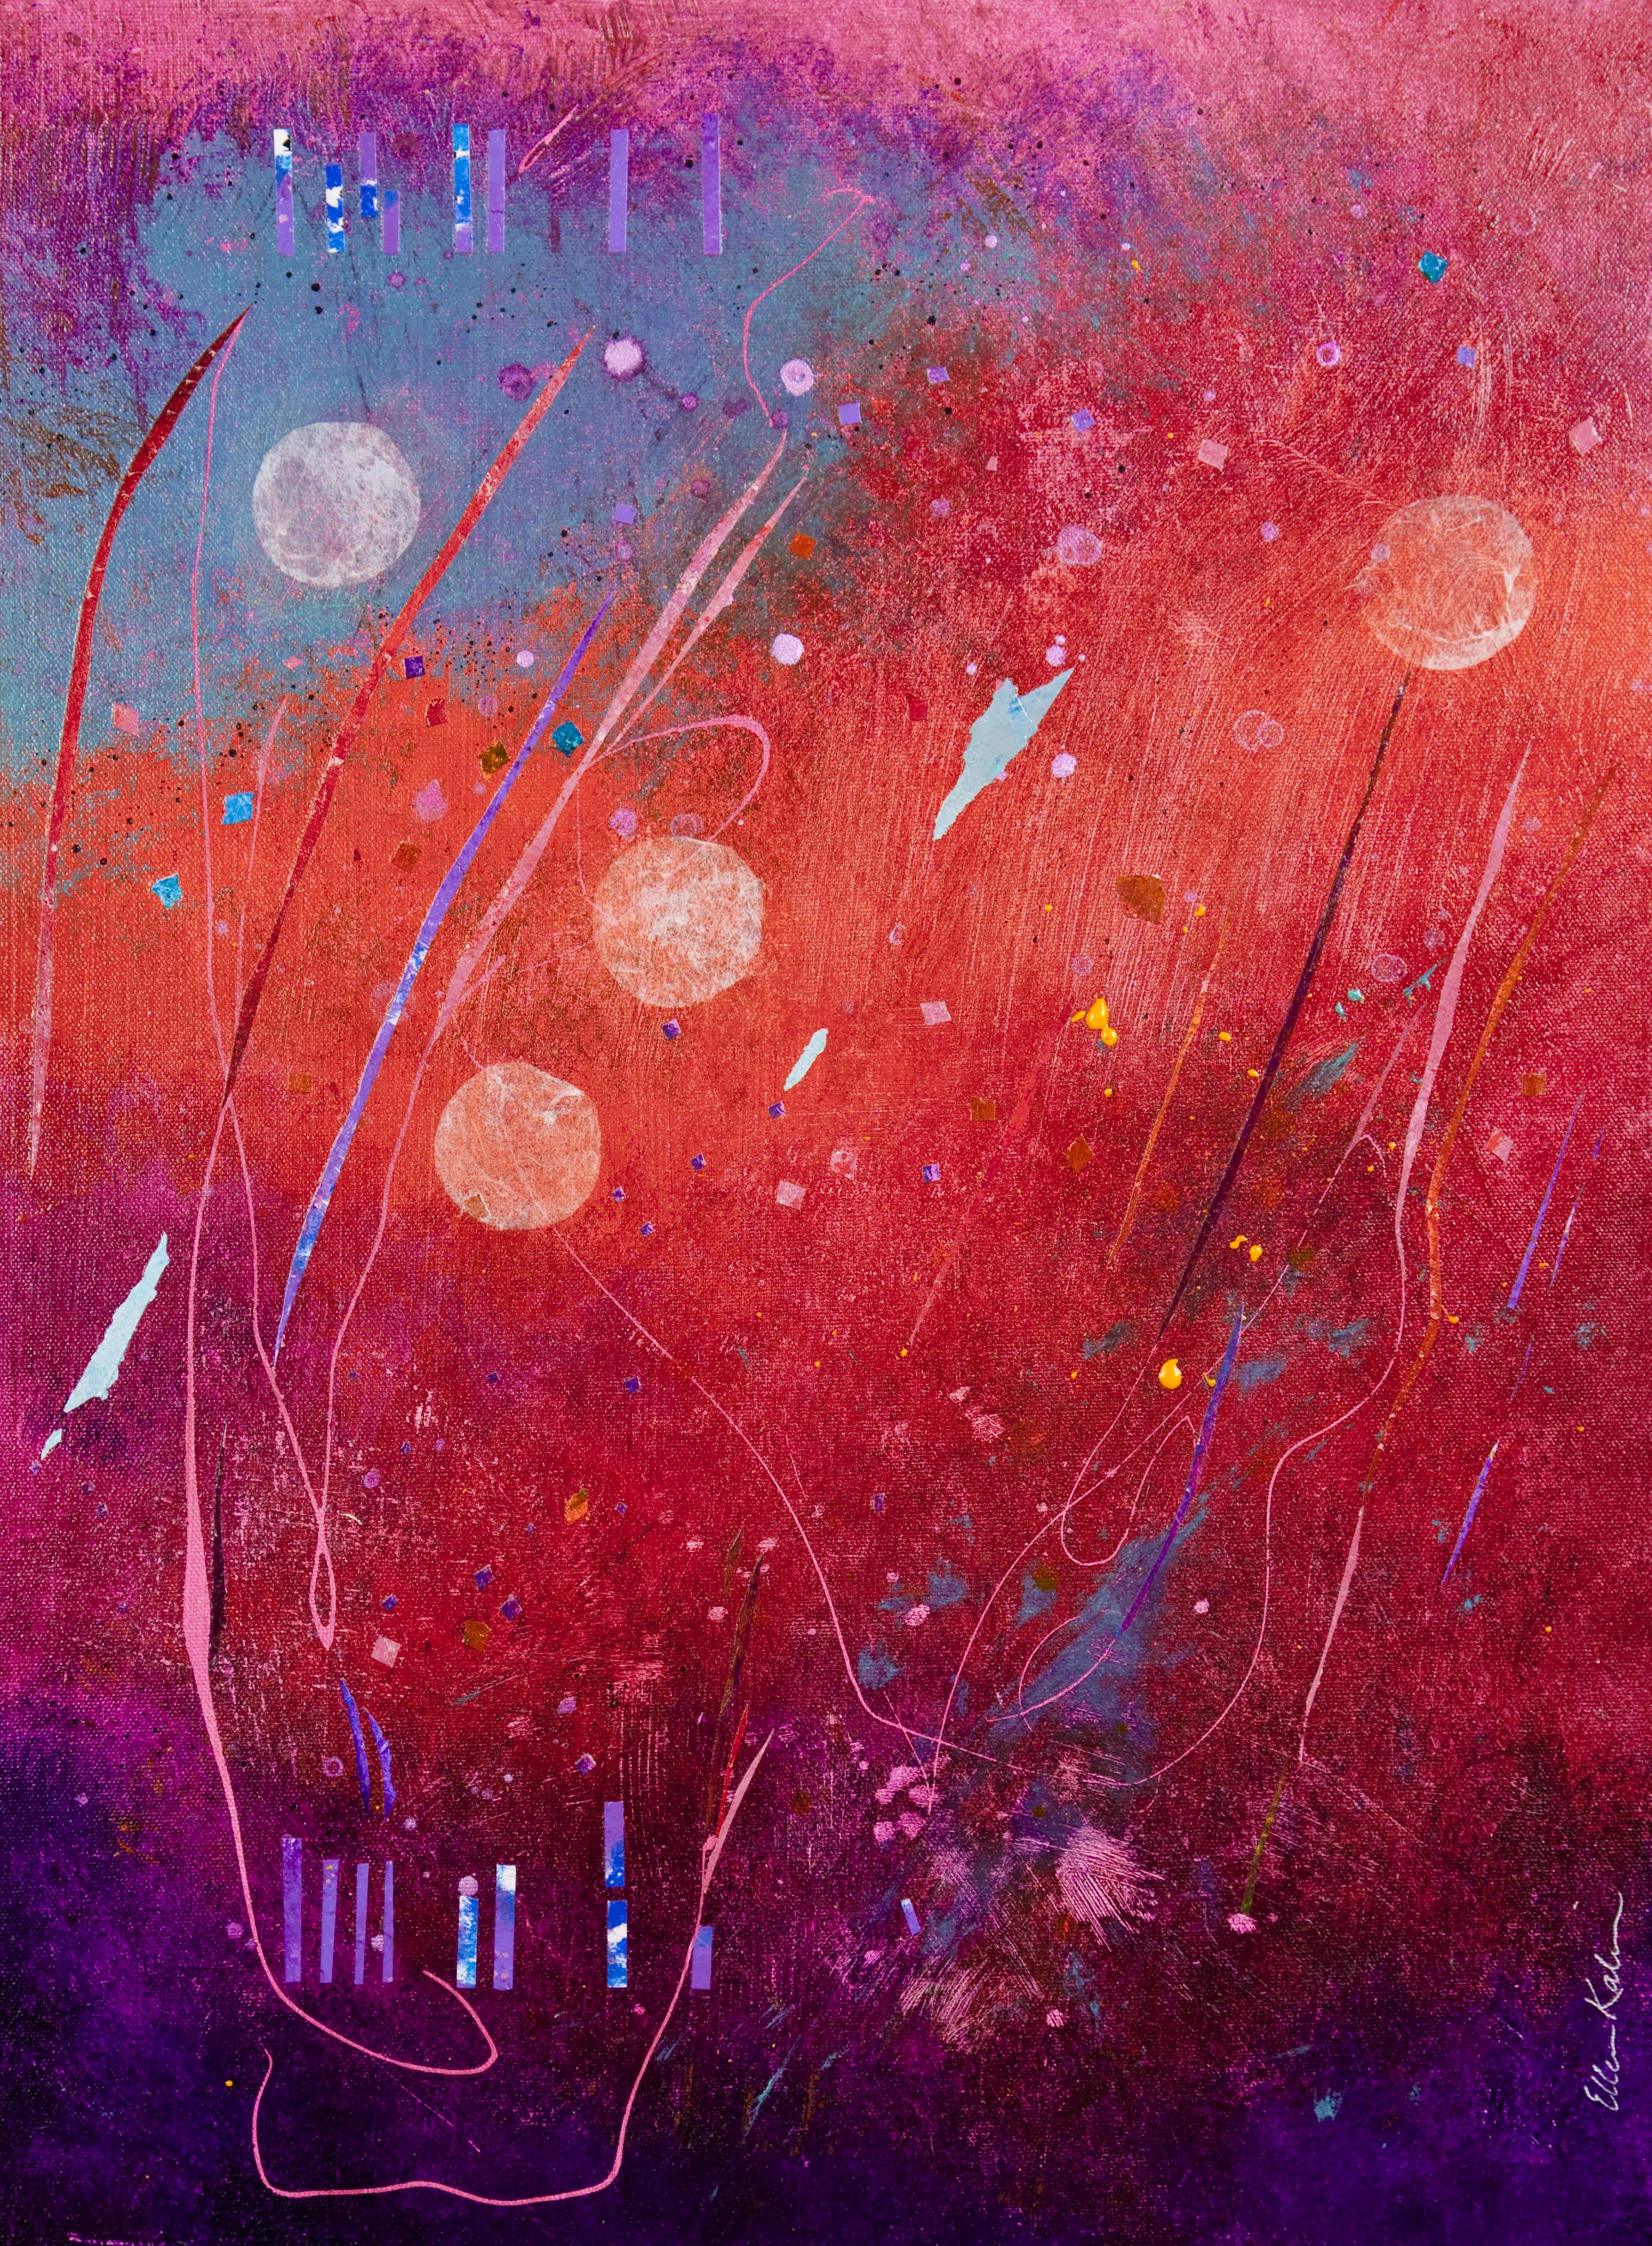 Bright Storm - 18x24